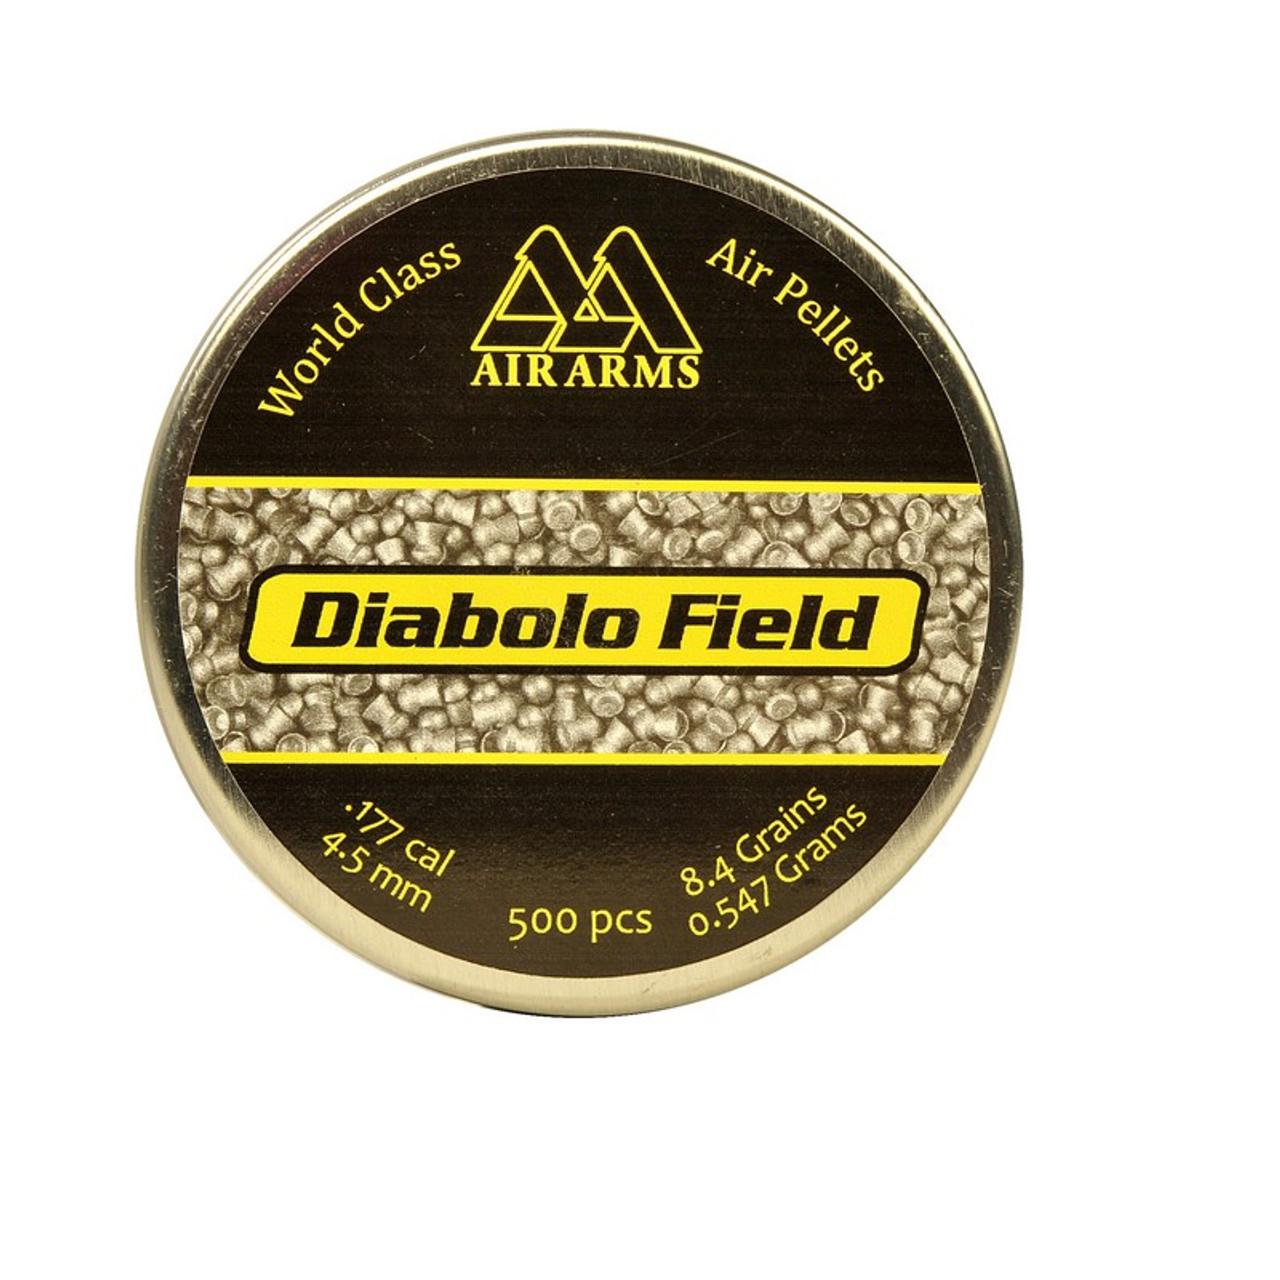 Best price for Air Arms Diablo Field .22 Pellets, on sale at Bradford Stalker